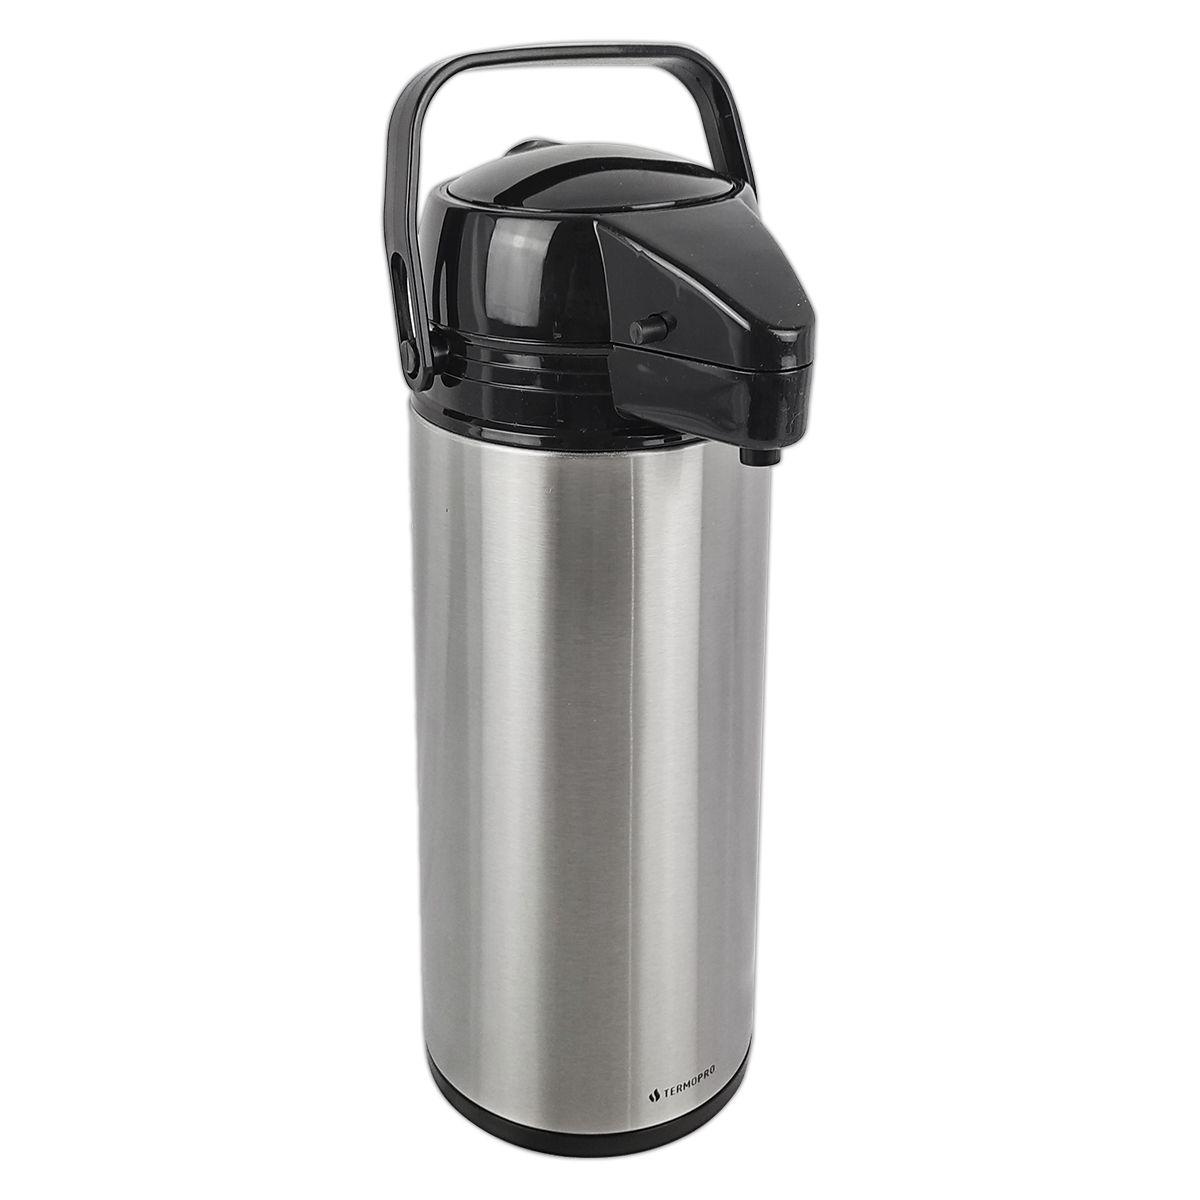 Garrafa Termica Inox Basic Airpot 1,9L - Termopro